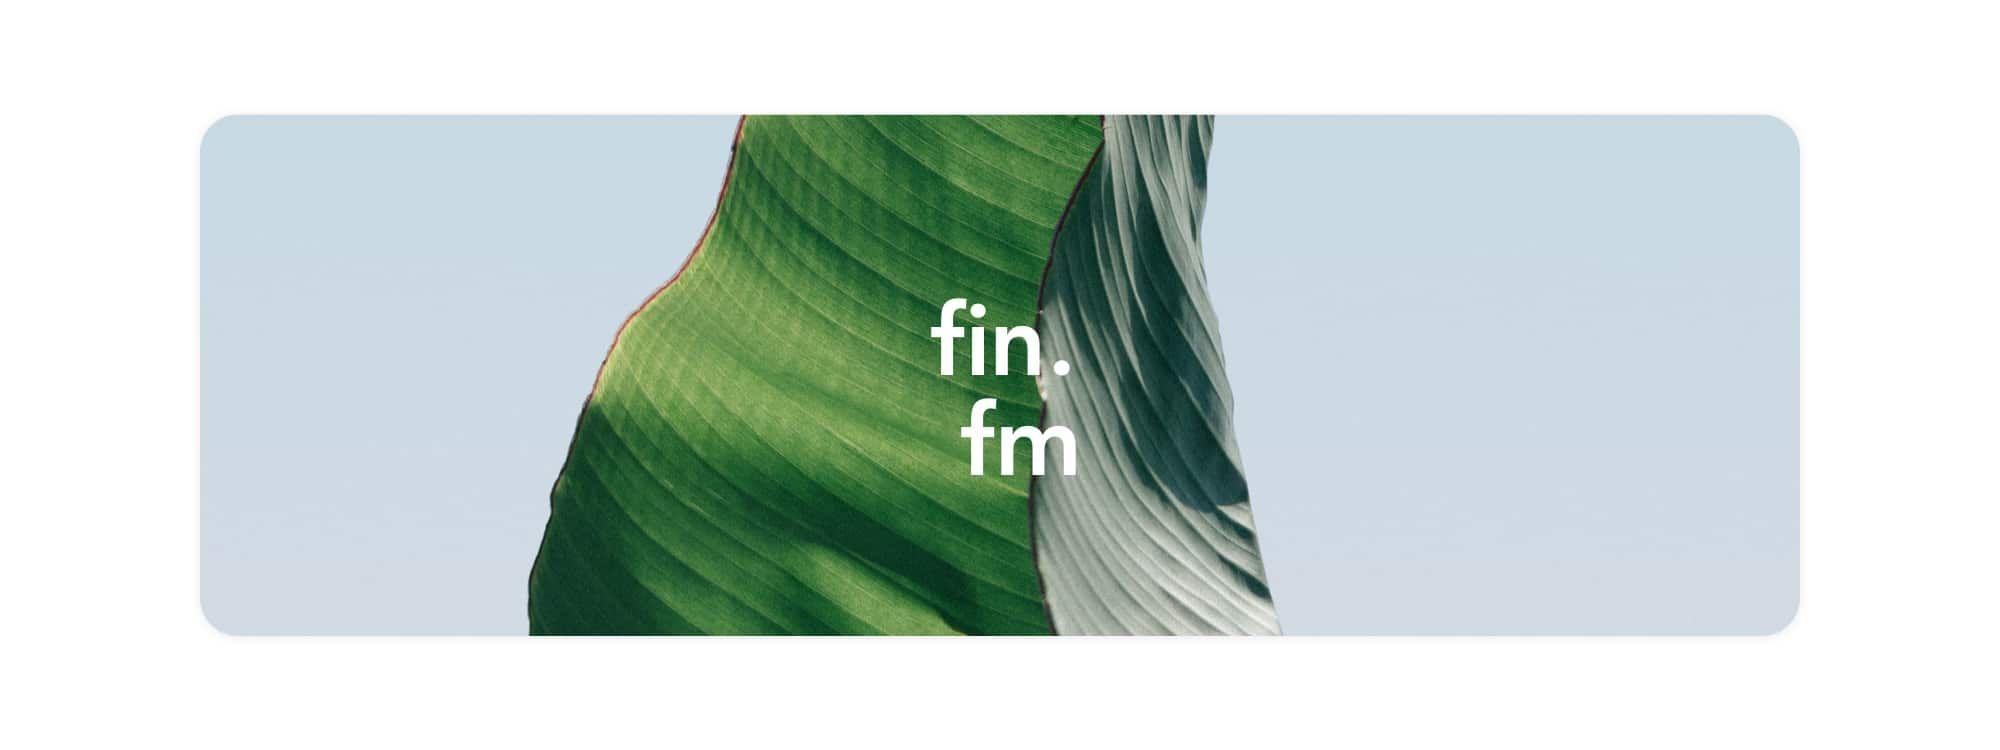 finfm